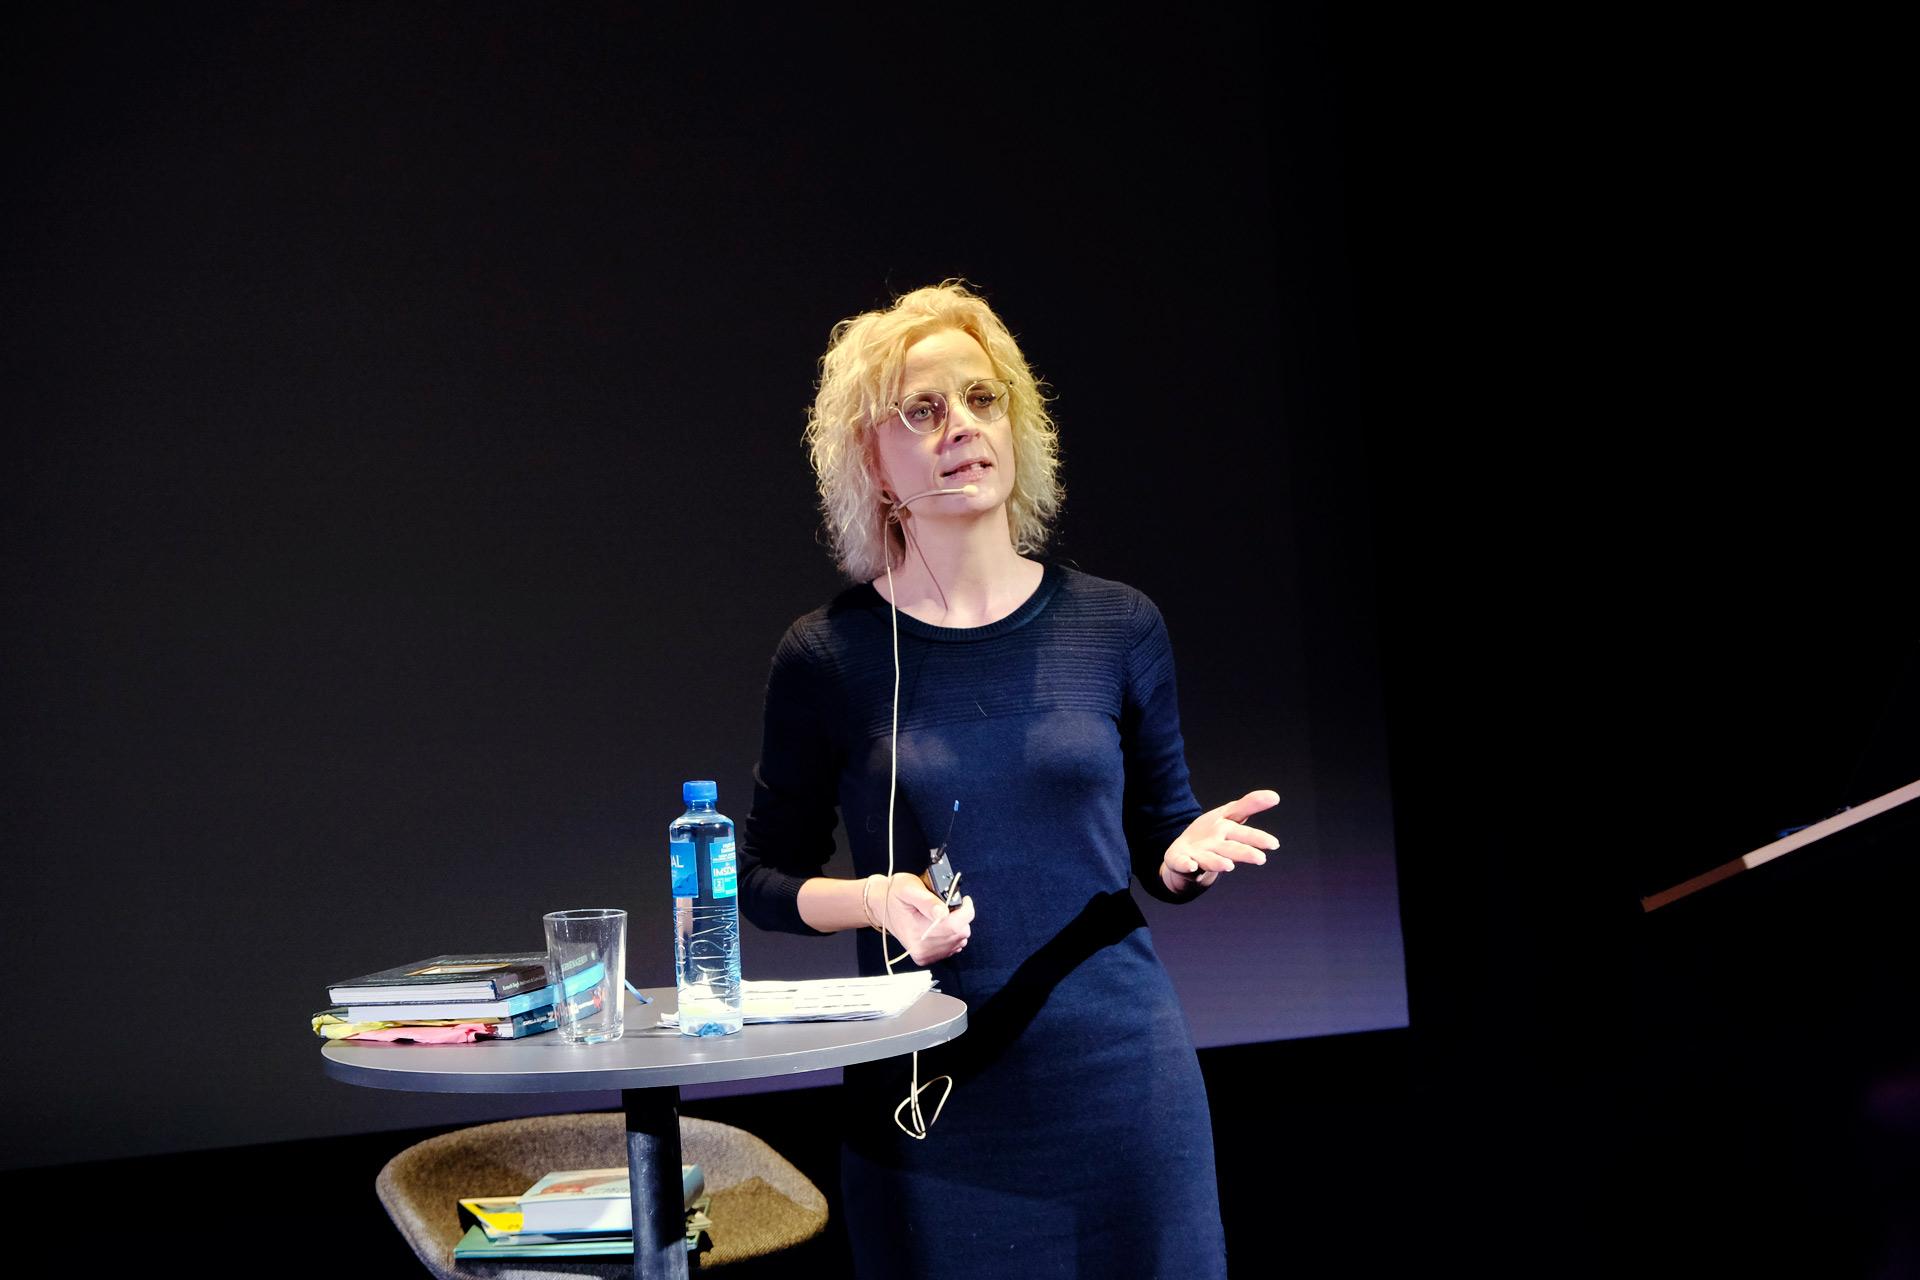 Ayoe Qvist Henkel under Nordisk barnebokkonferanse 2019 i Stavanger, foto: Niklas R. Lello